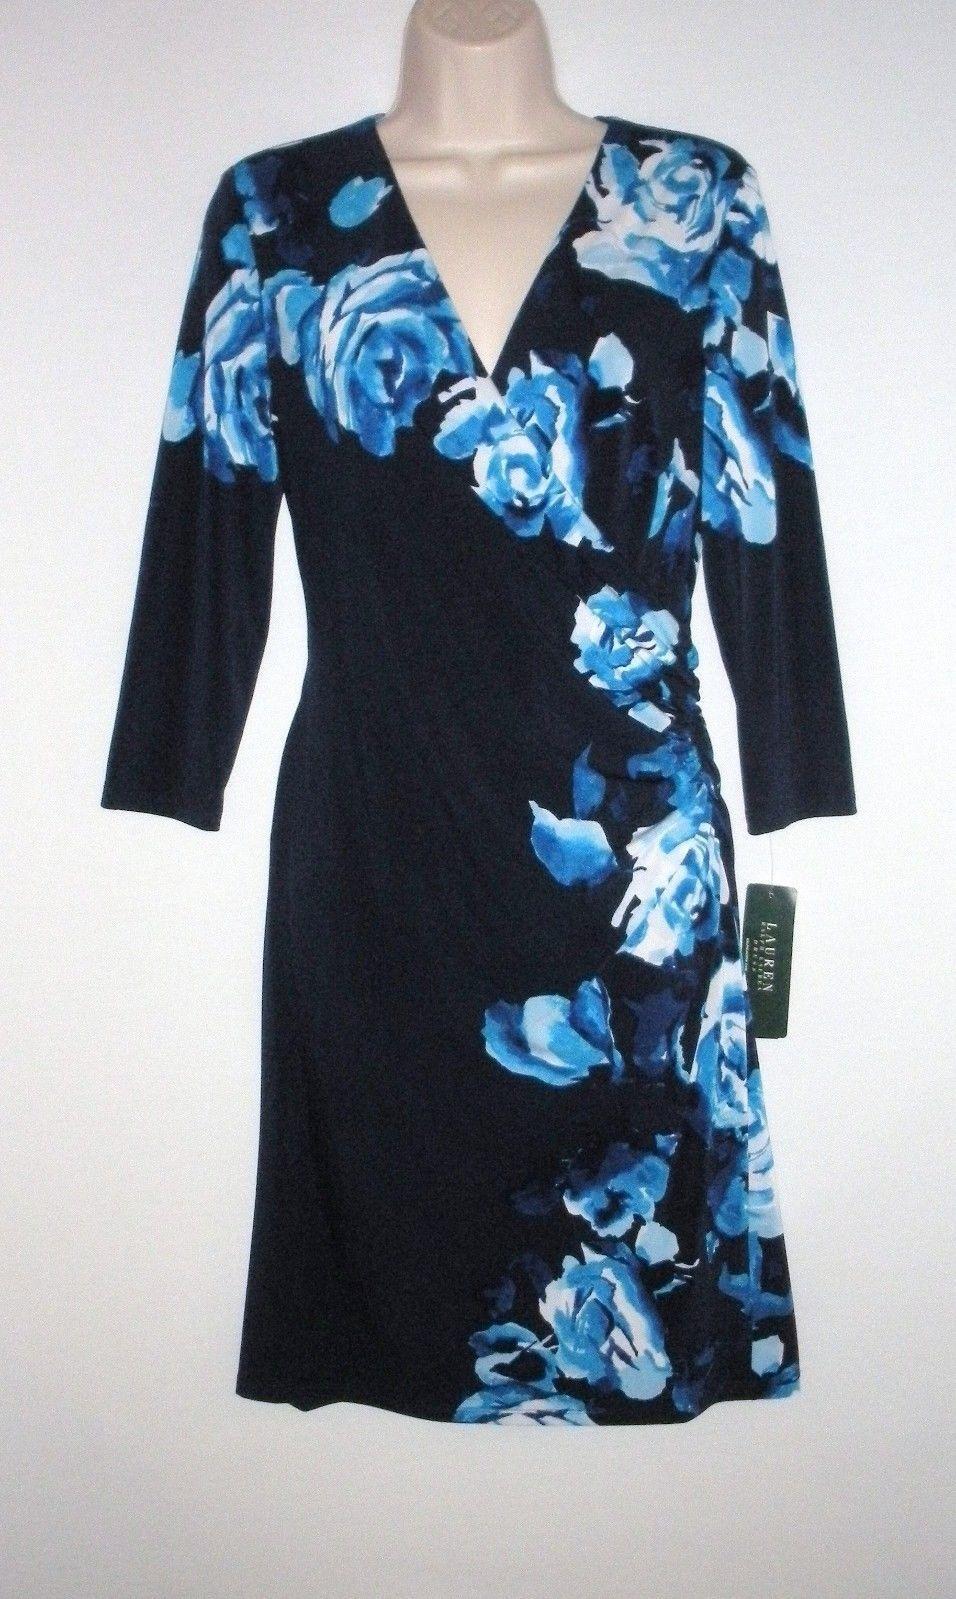 NWT MSRP  - LAUREN RALPH LAUREN Floral 3 4 Sleeve Jersey Dress, Blau Multi